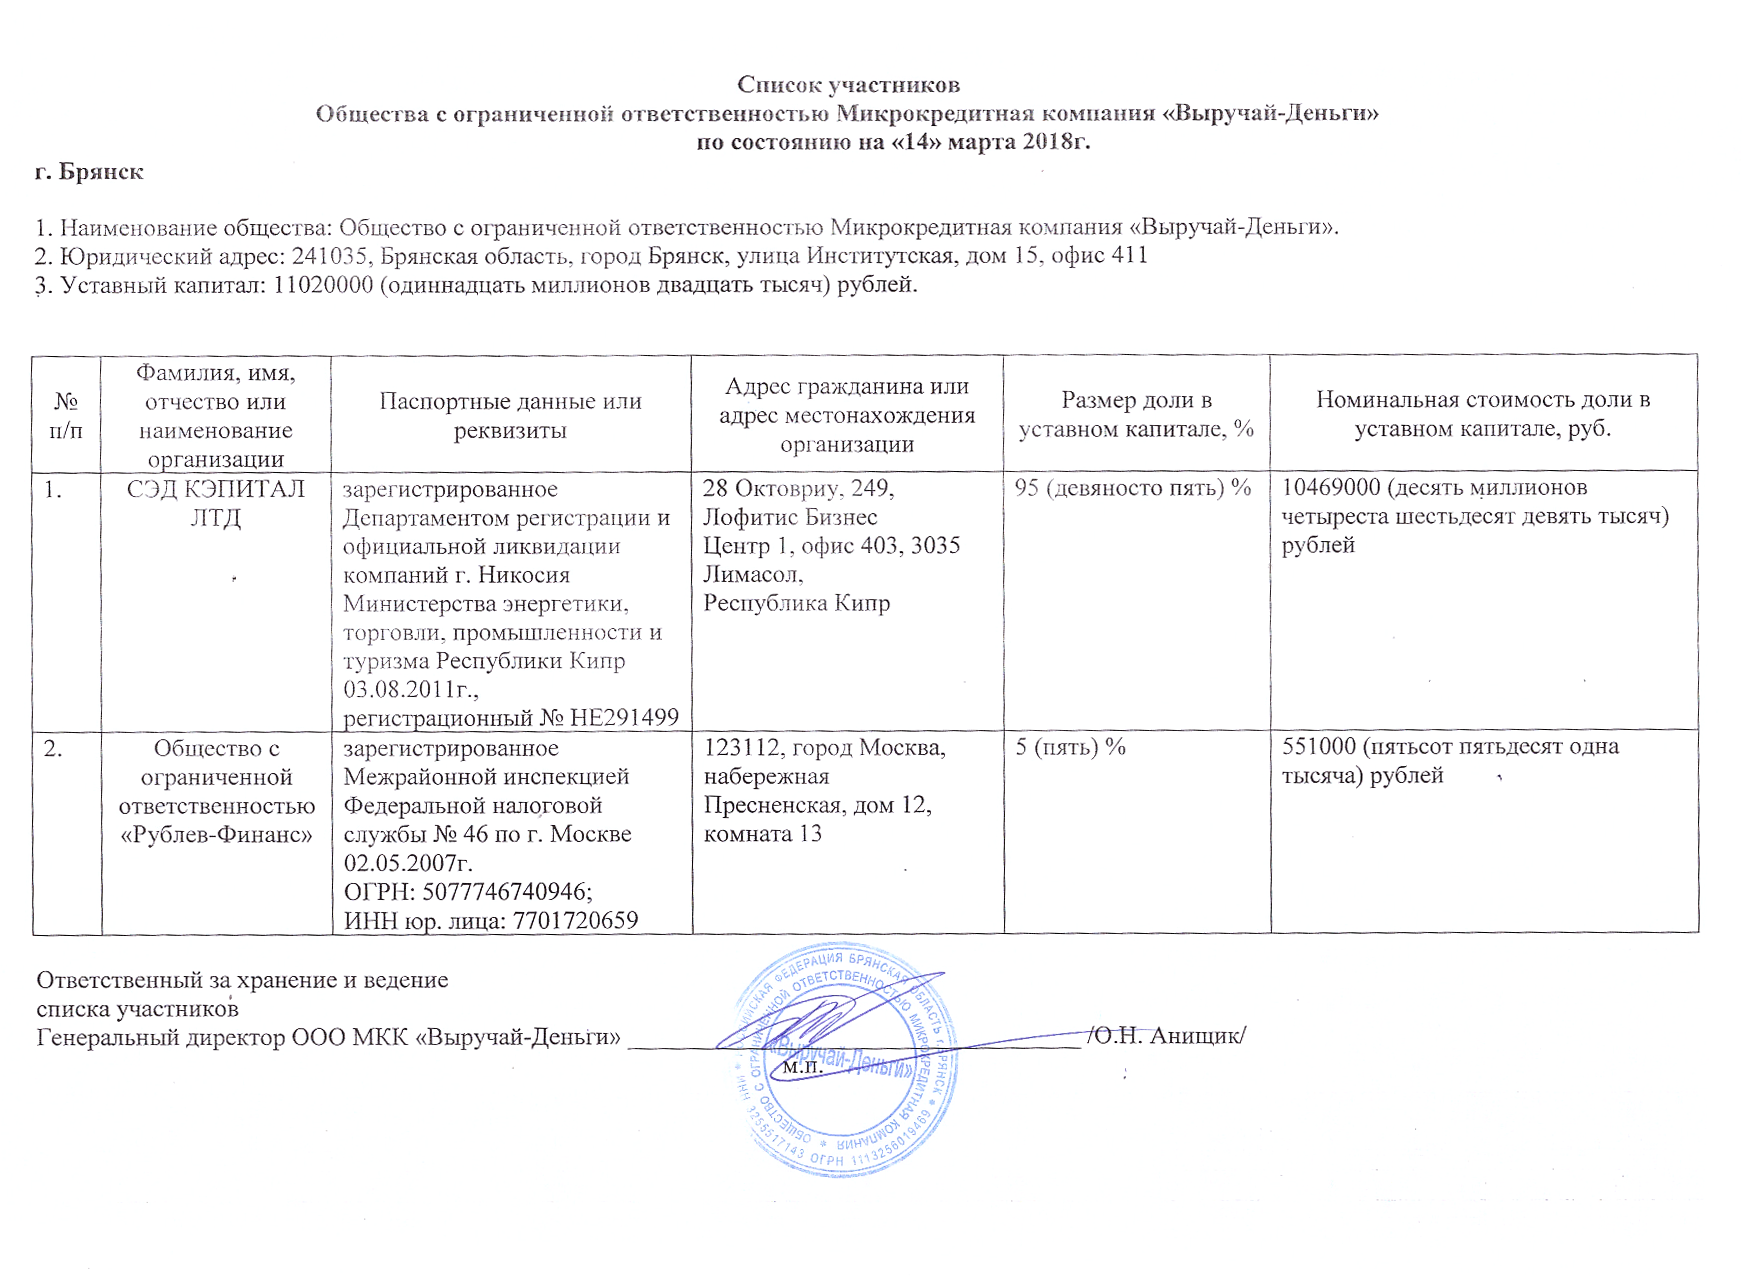 Автоломбард в Ростове-на-Дону: кредит под залог ПТС